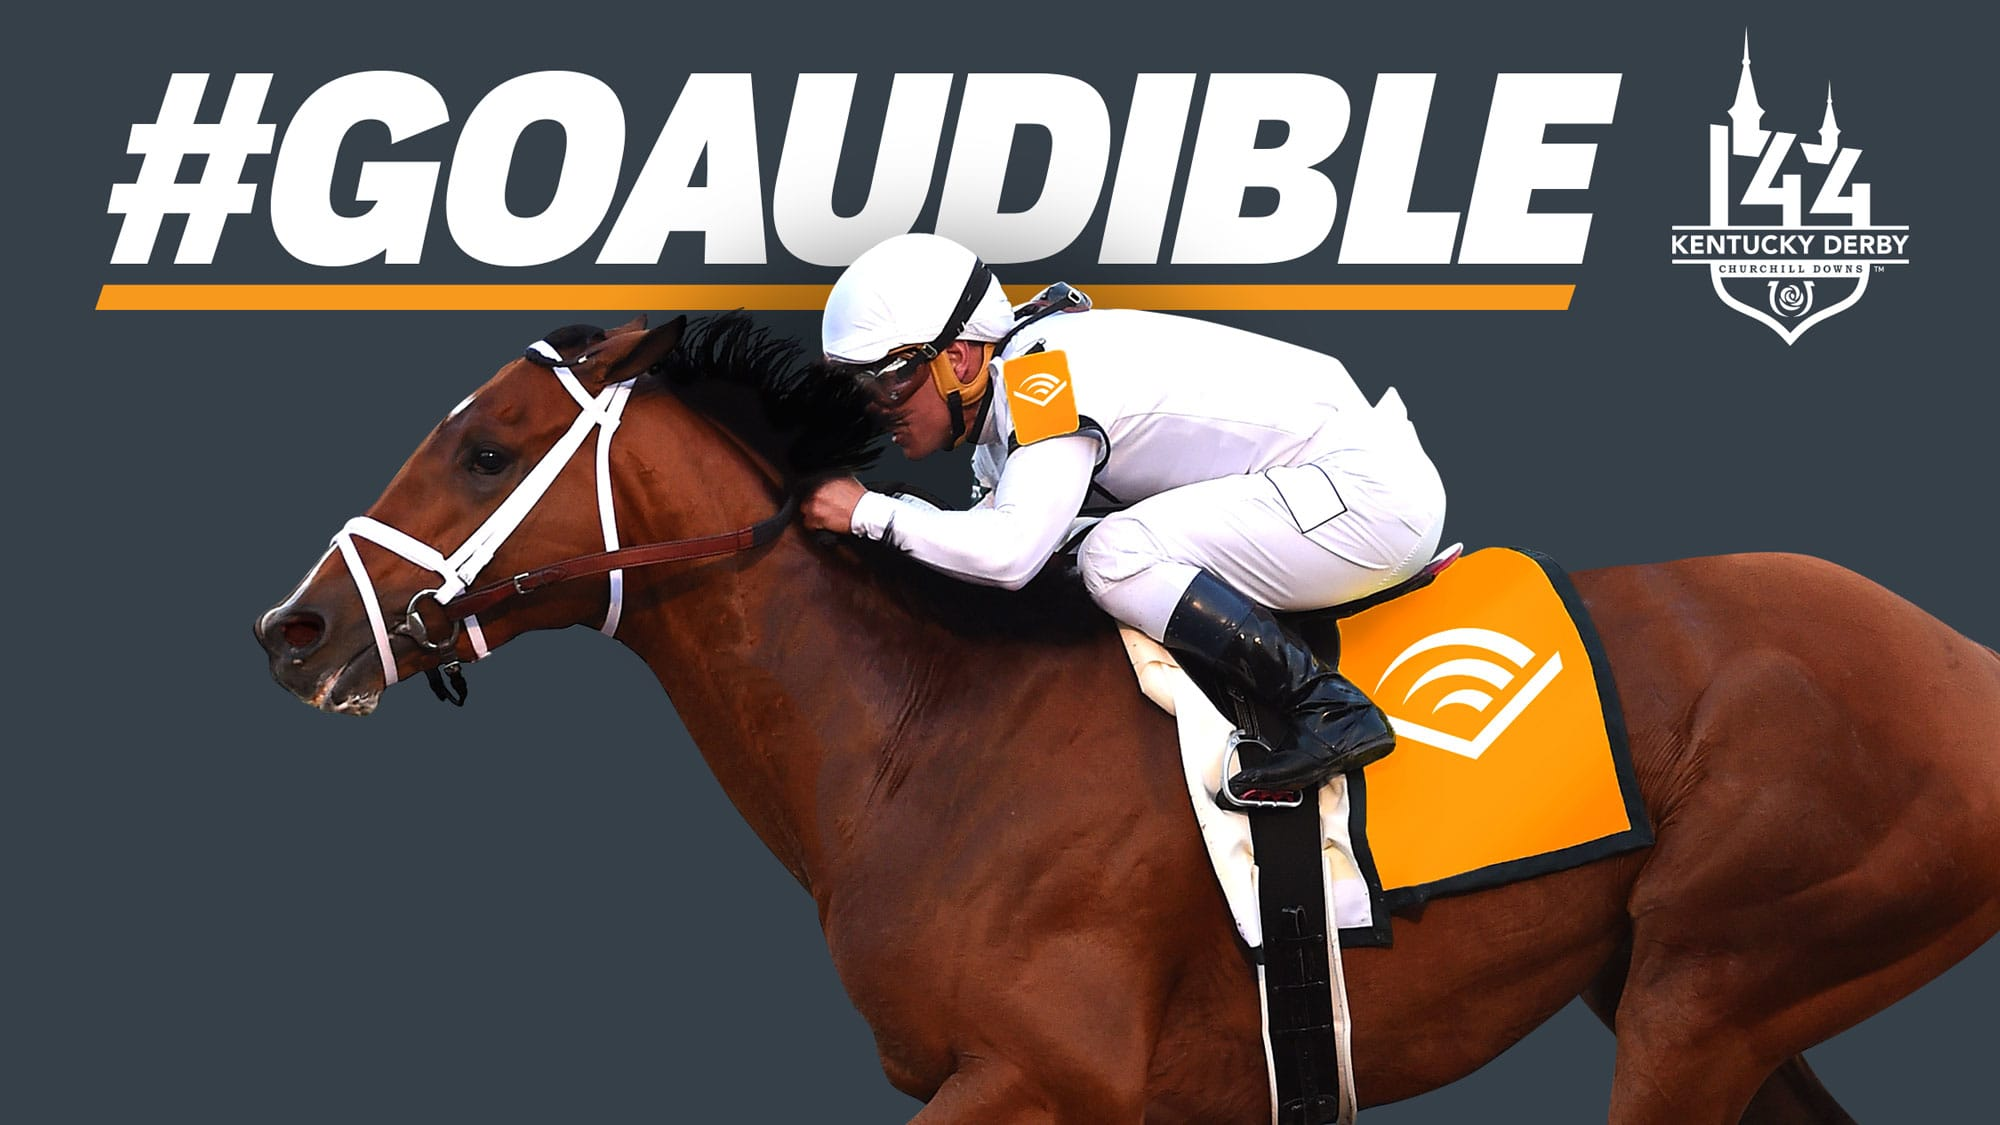 Amazon sponsors Kentucky Derby horse Audible